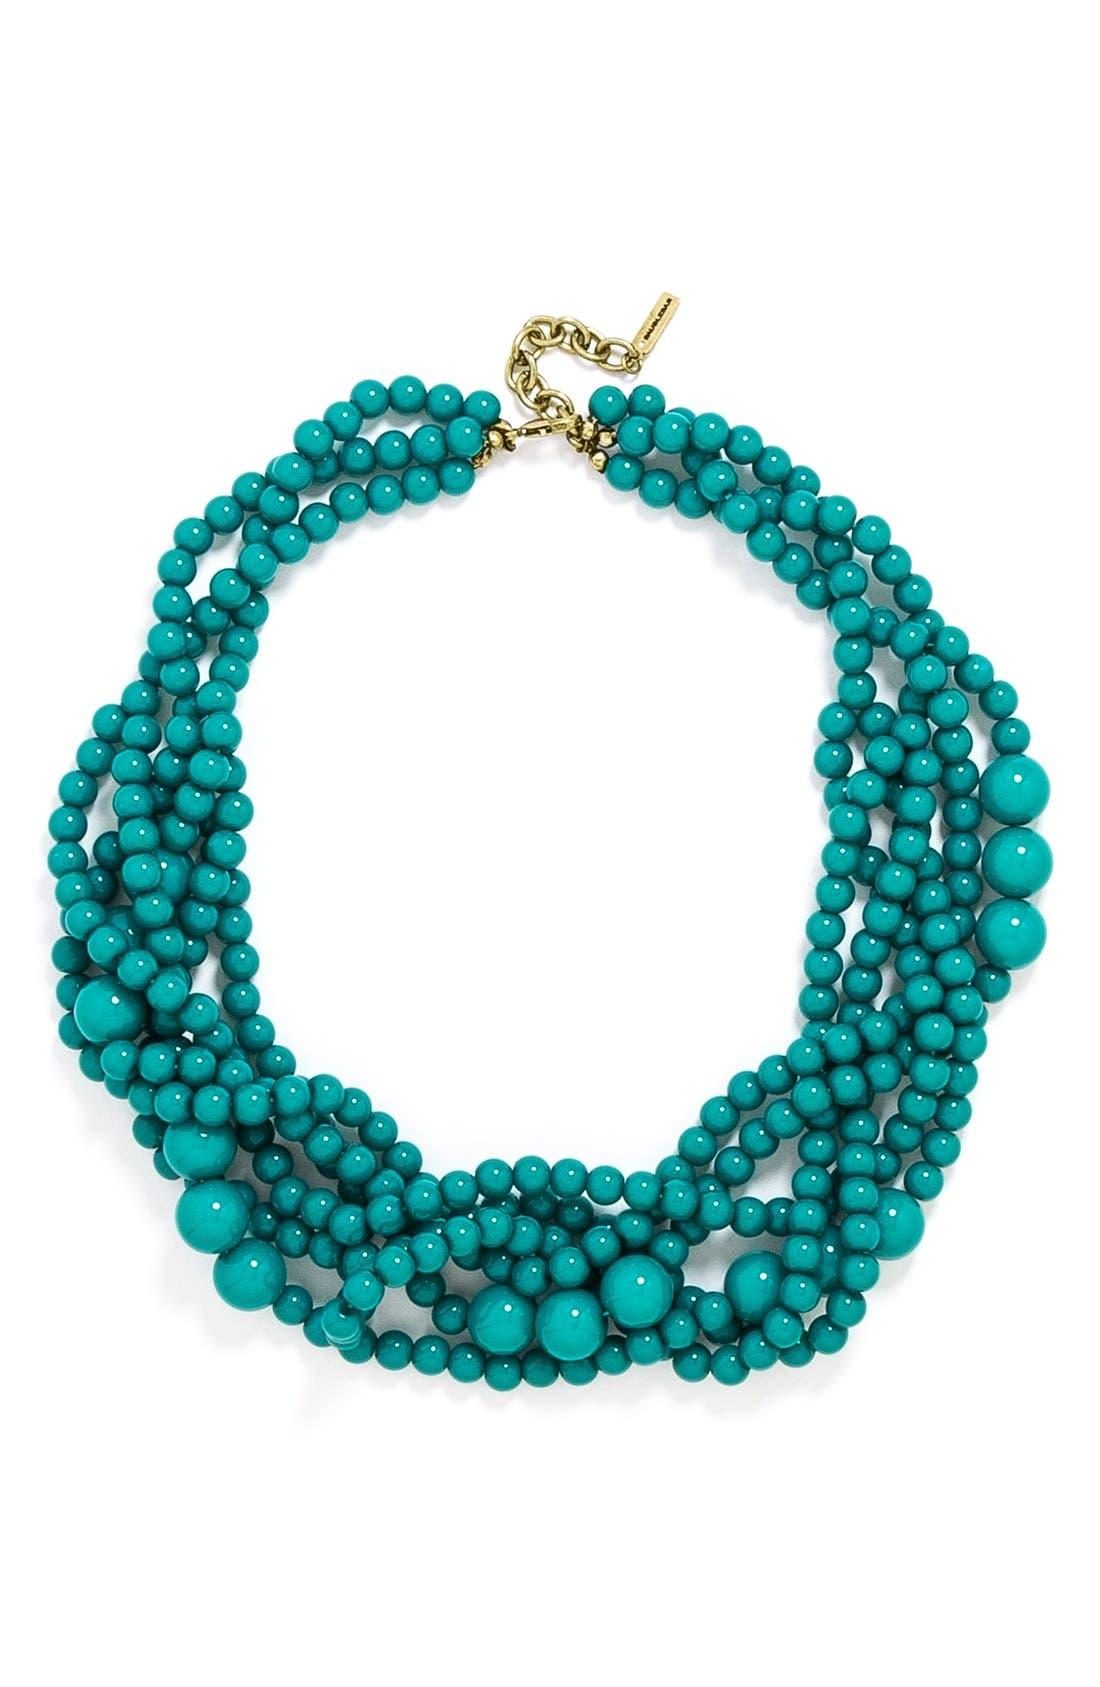 Alternate Image 1 Selected - BaubleBar 'Bubblestream' Collar Necklace